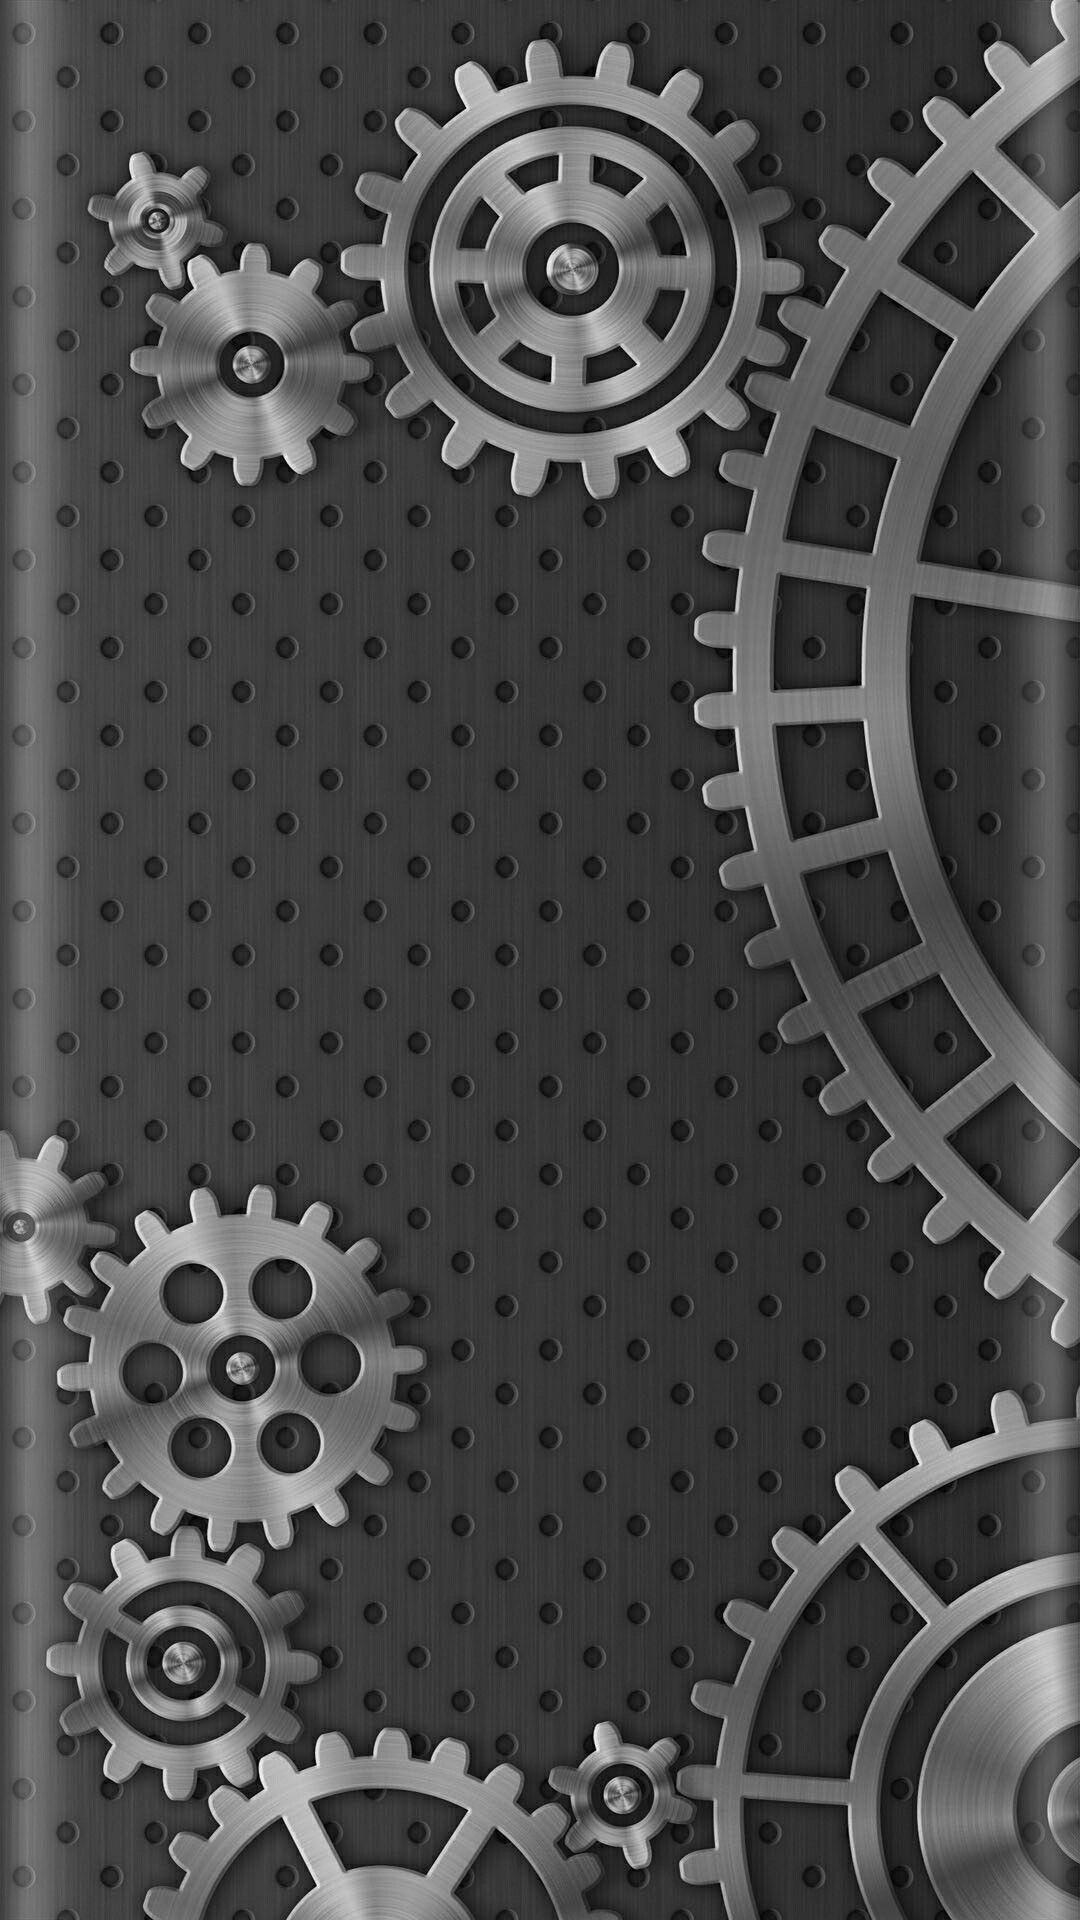 Dope Wallpapers, Iphone Wallpapers, Iphone Backgrounds, Wallpaper  Backgrounds, Apple Iphone, Iphone 6, Mechanical Engineering, Display  Window, Gera